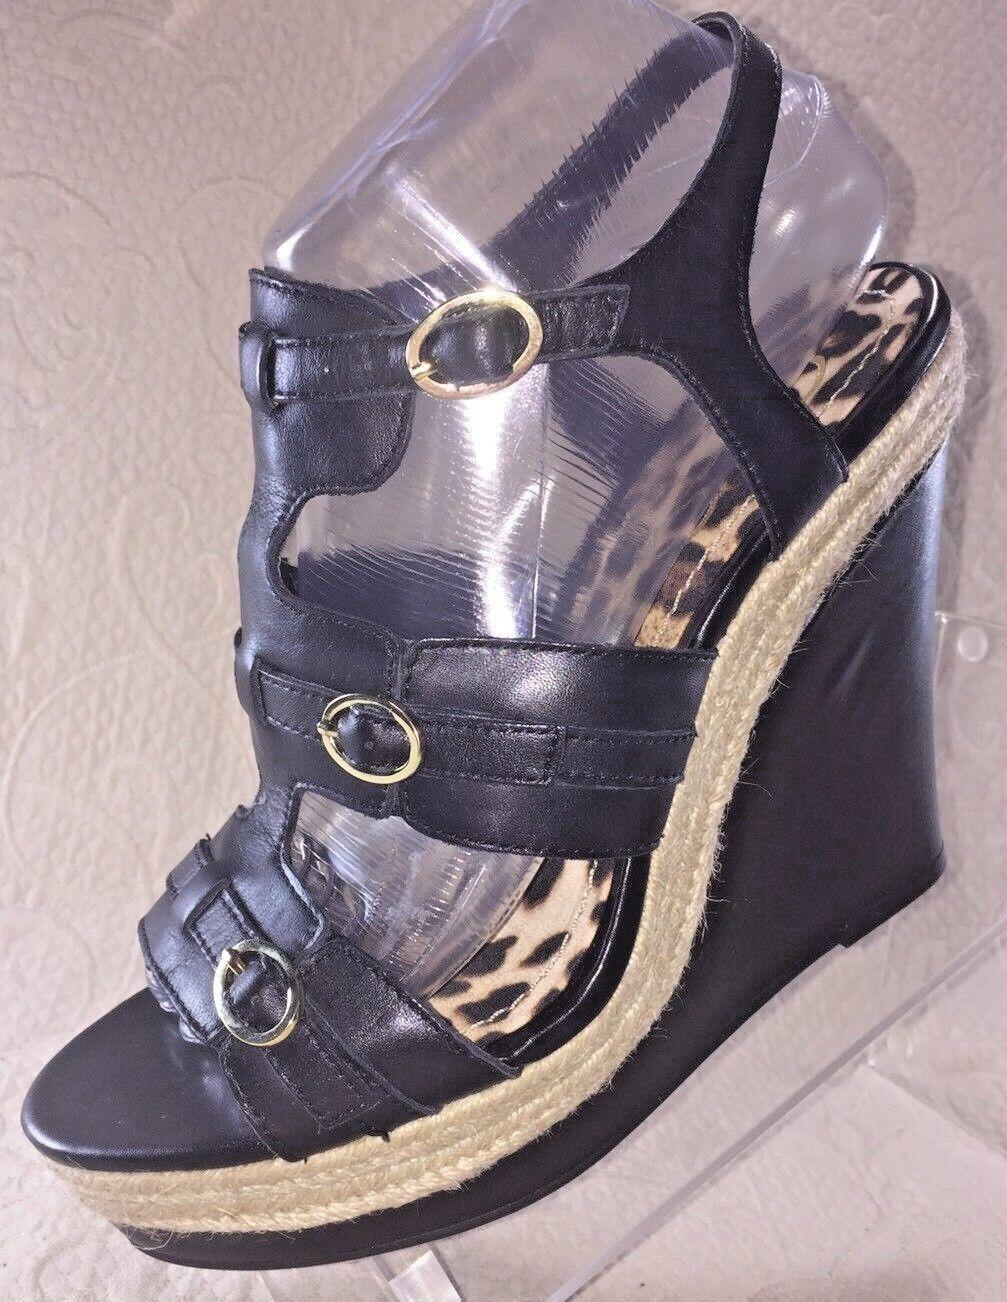 Jessica Simpson Mujer 8 Mack Negro Con Taco Sandalia Hebilla De Plataforma Zapato Nuevo en Caja